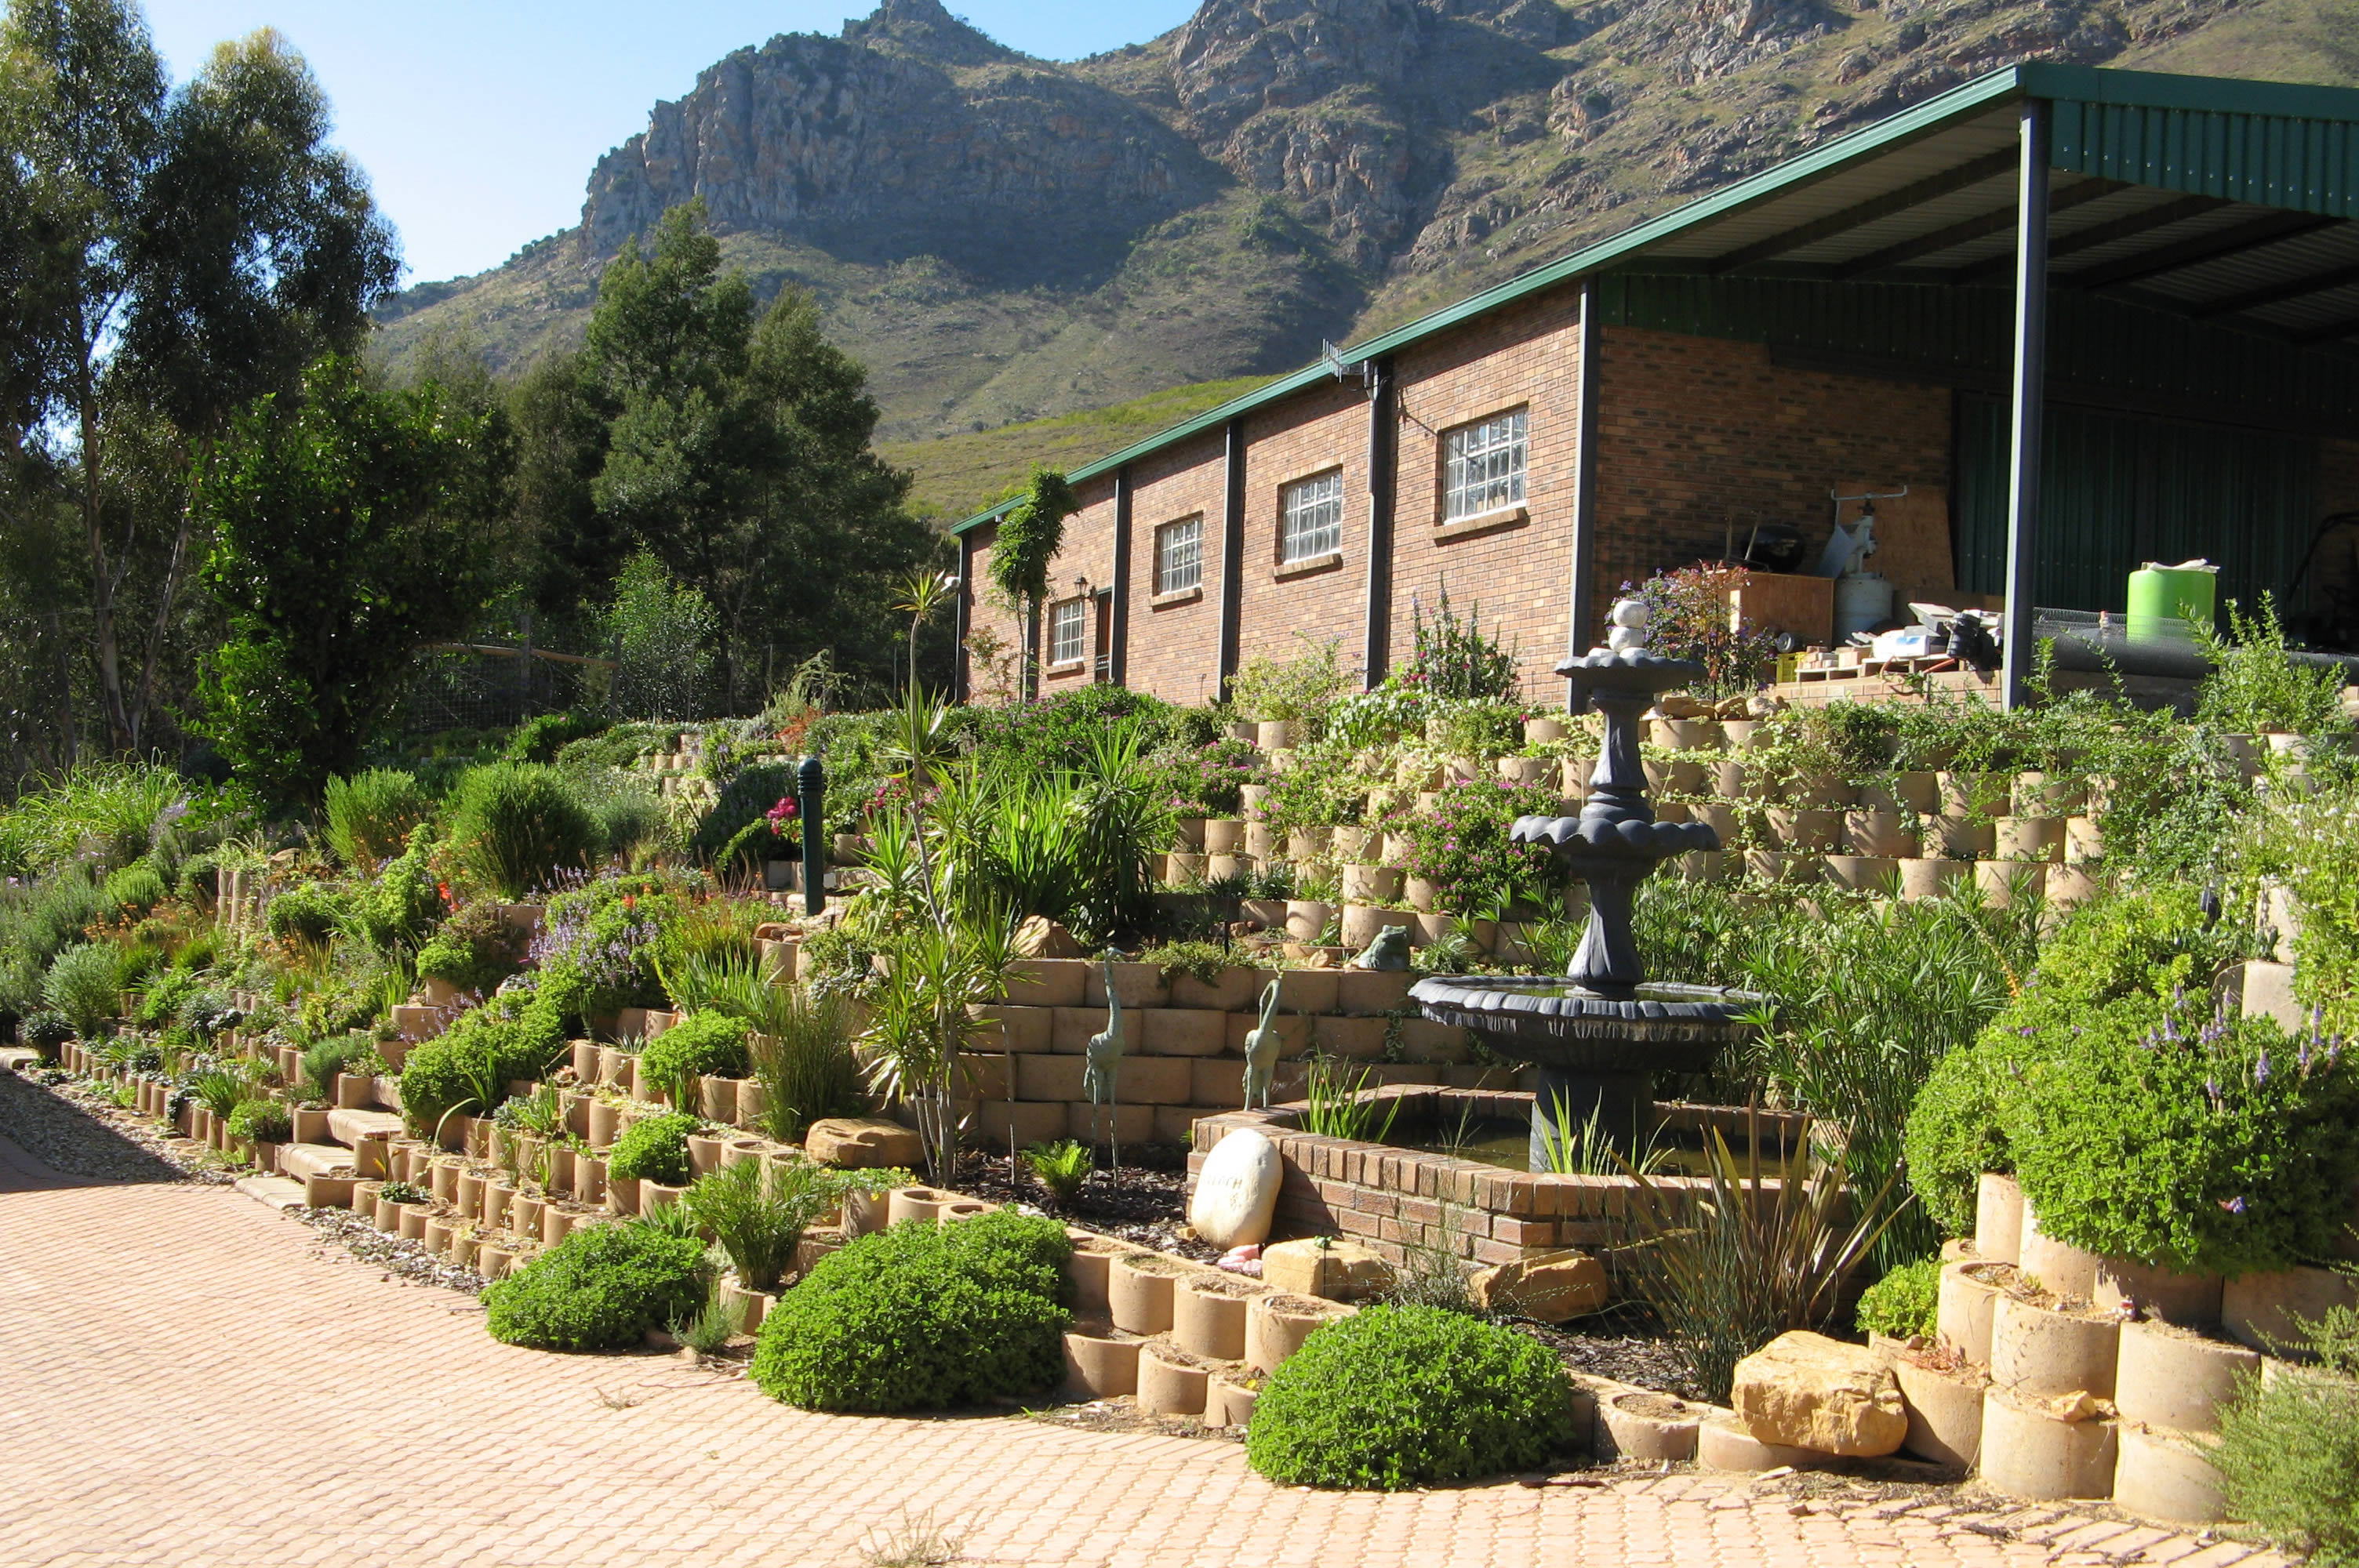 Garden landscaping with modular blocks - plantable